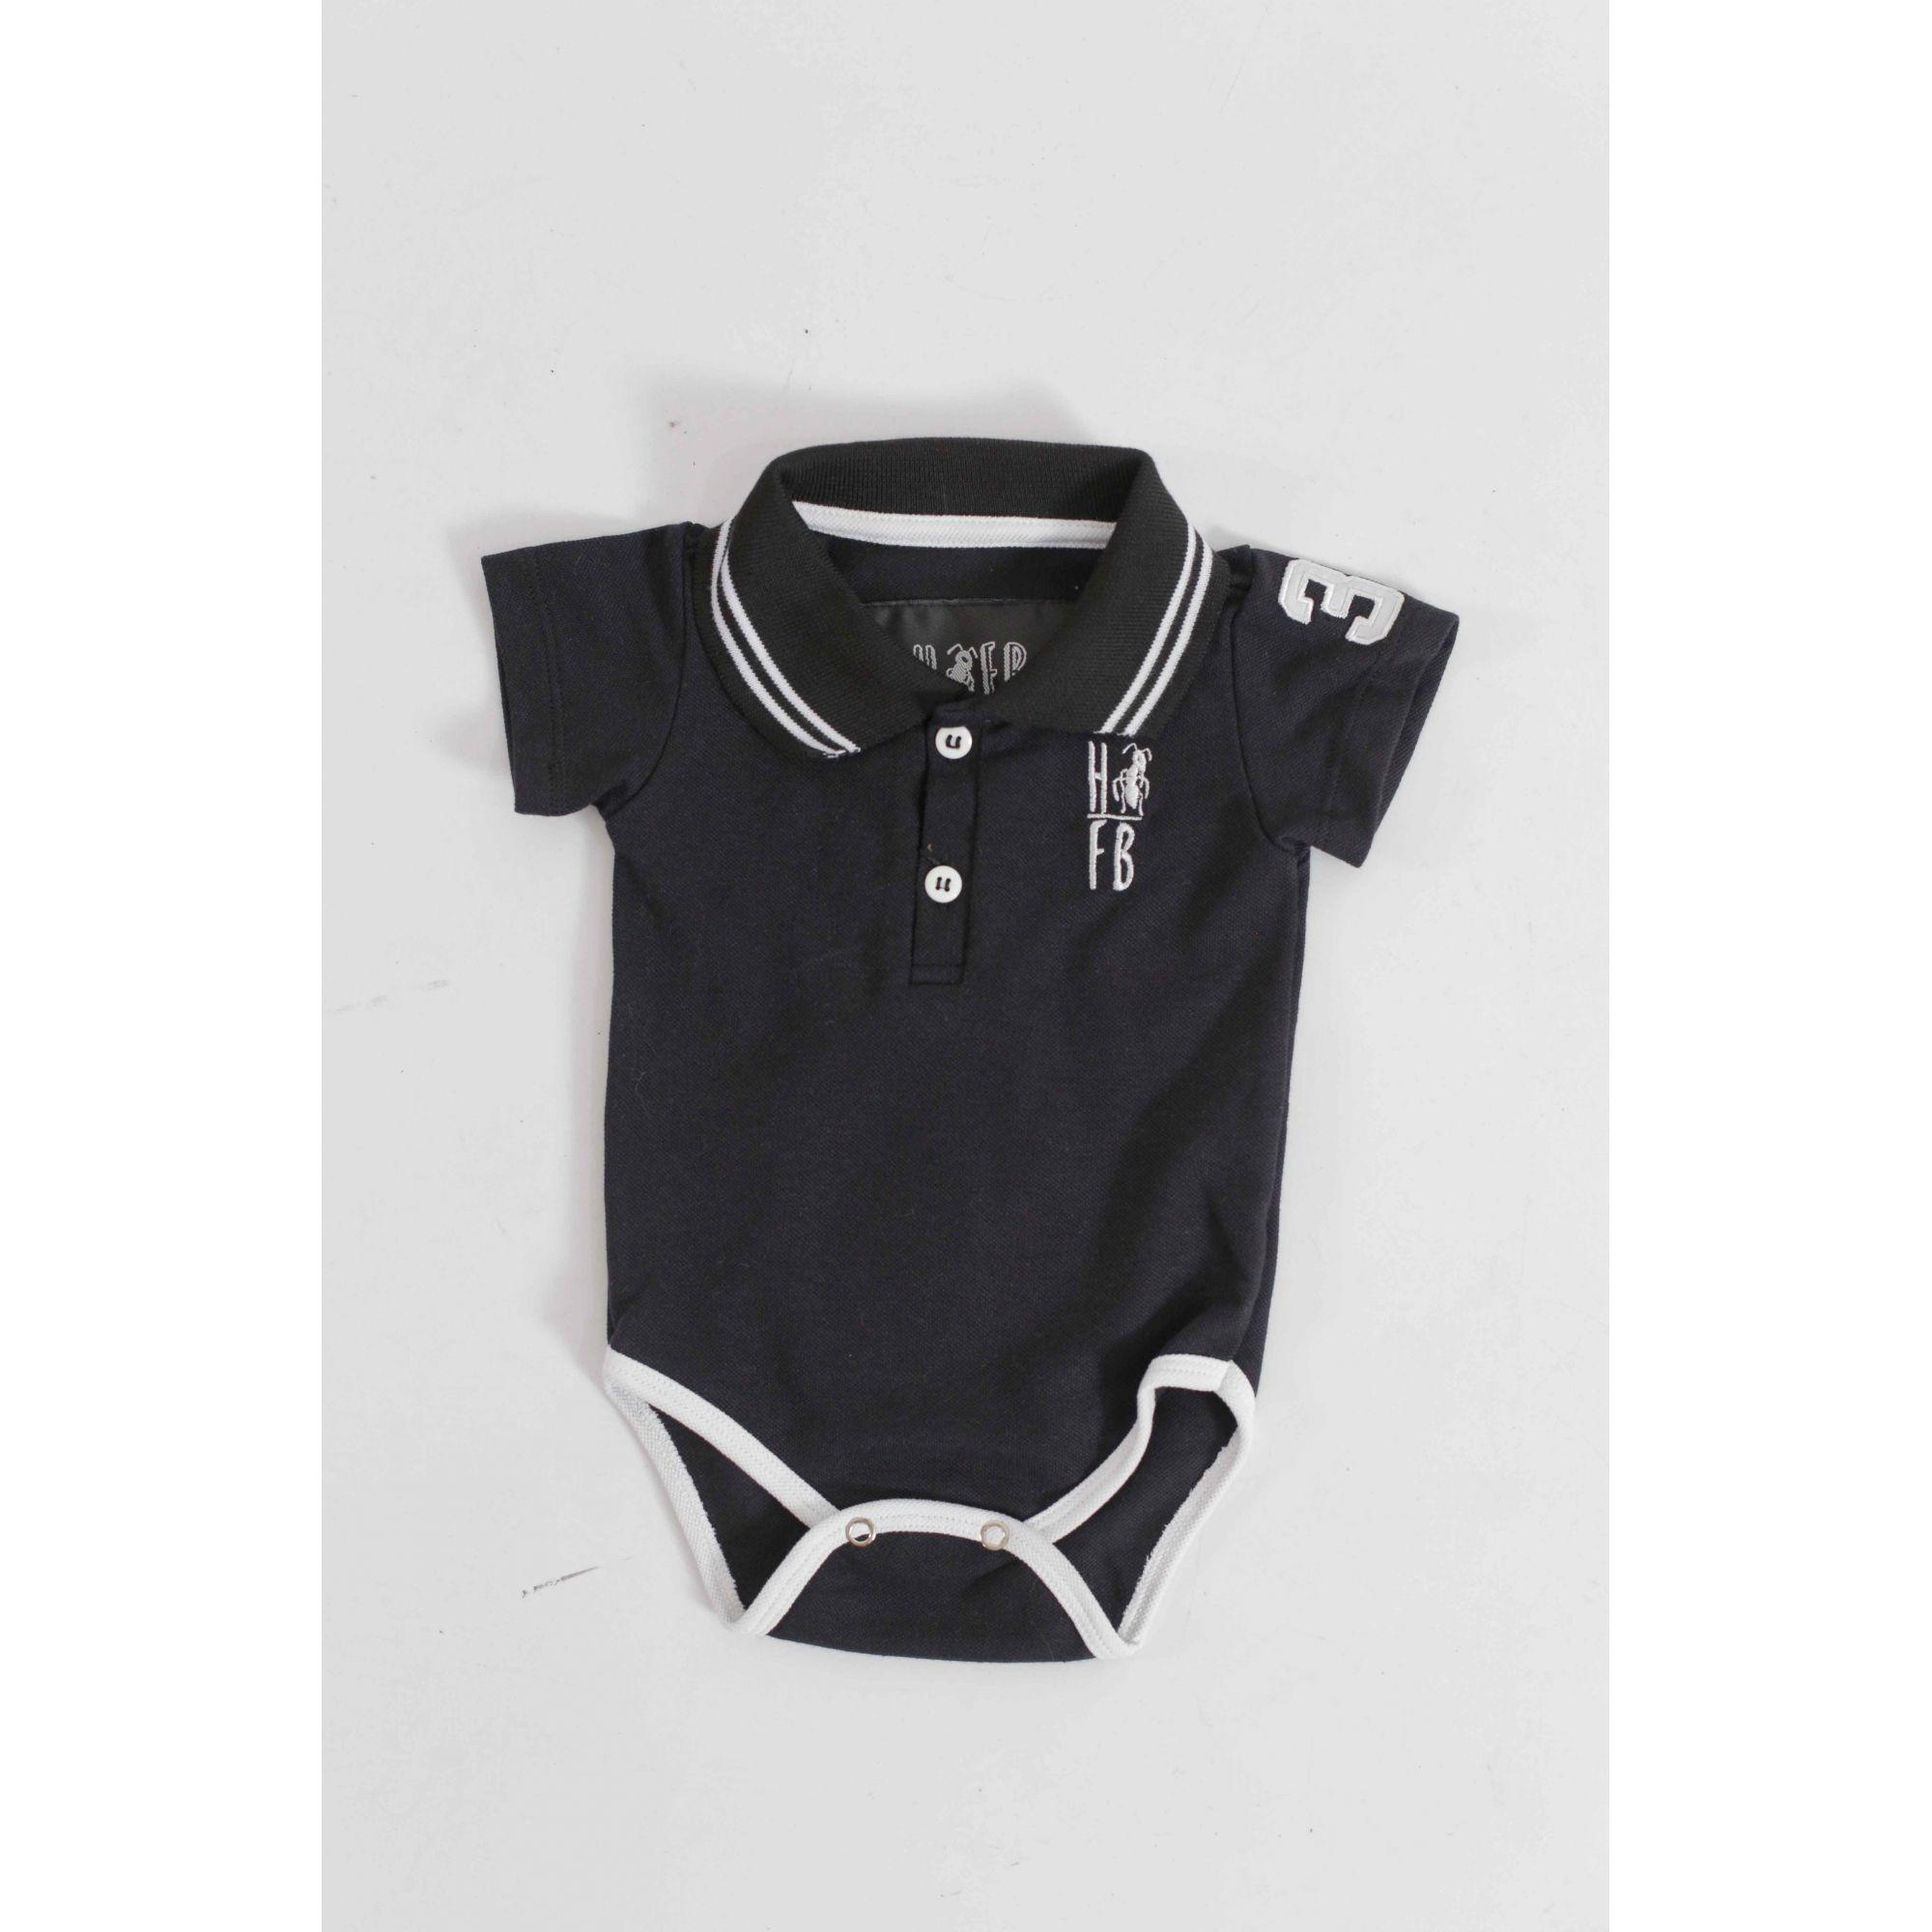 Camisa Polo ou body Infantil Preto Elegância  - Heitor Fashion Brazil